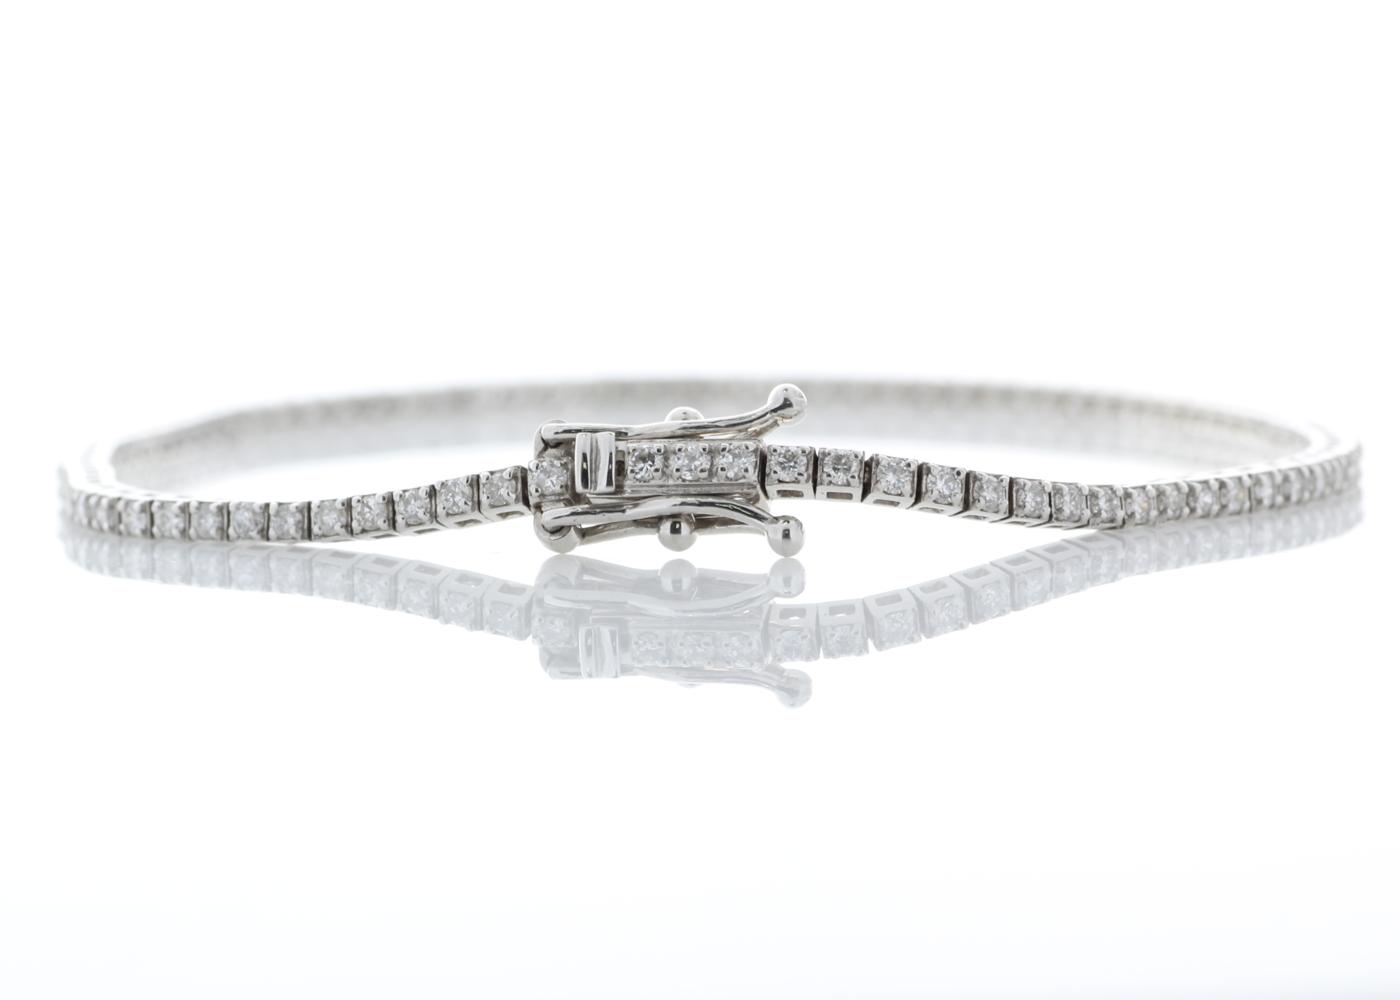 18ct White Gold Tennis Diamond Bracelet 1.11 Carats - Image 2 of 3